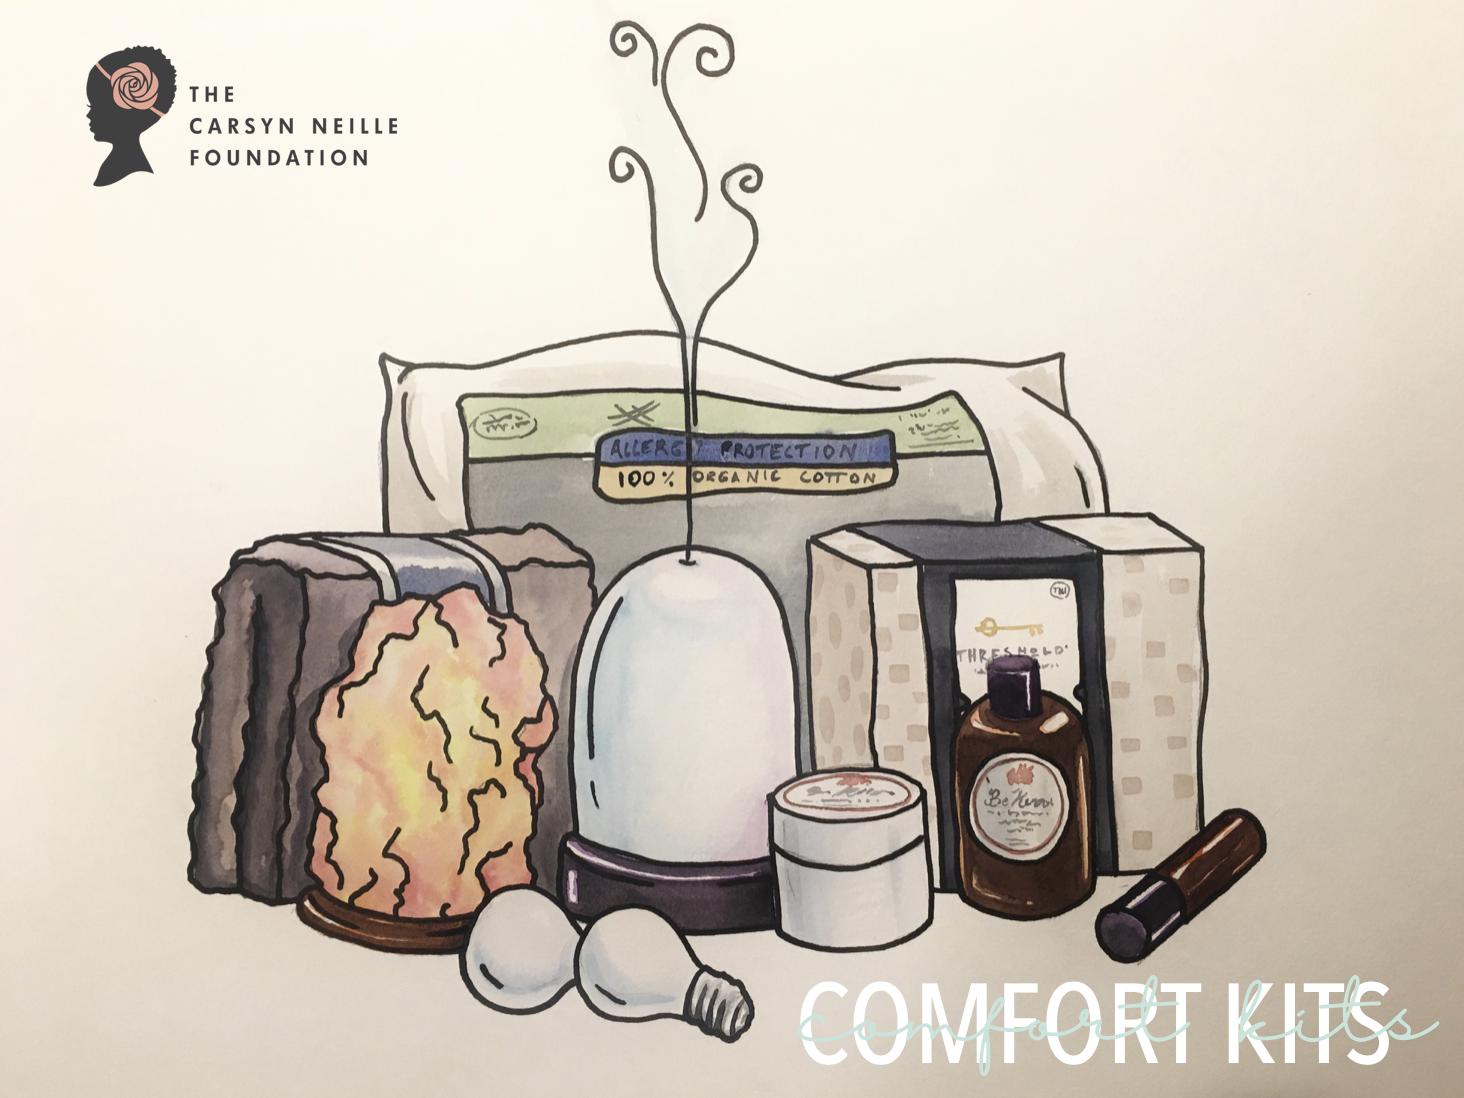 Comfort Kit Logo copy.png